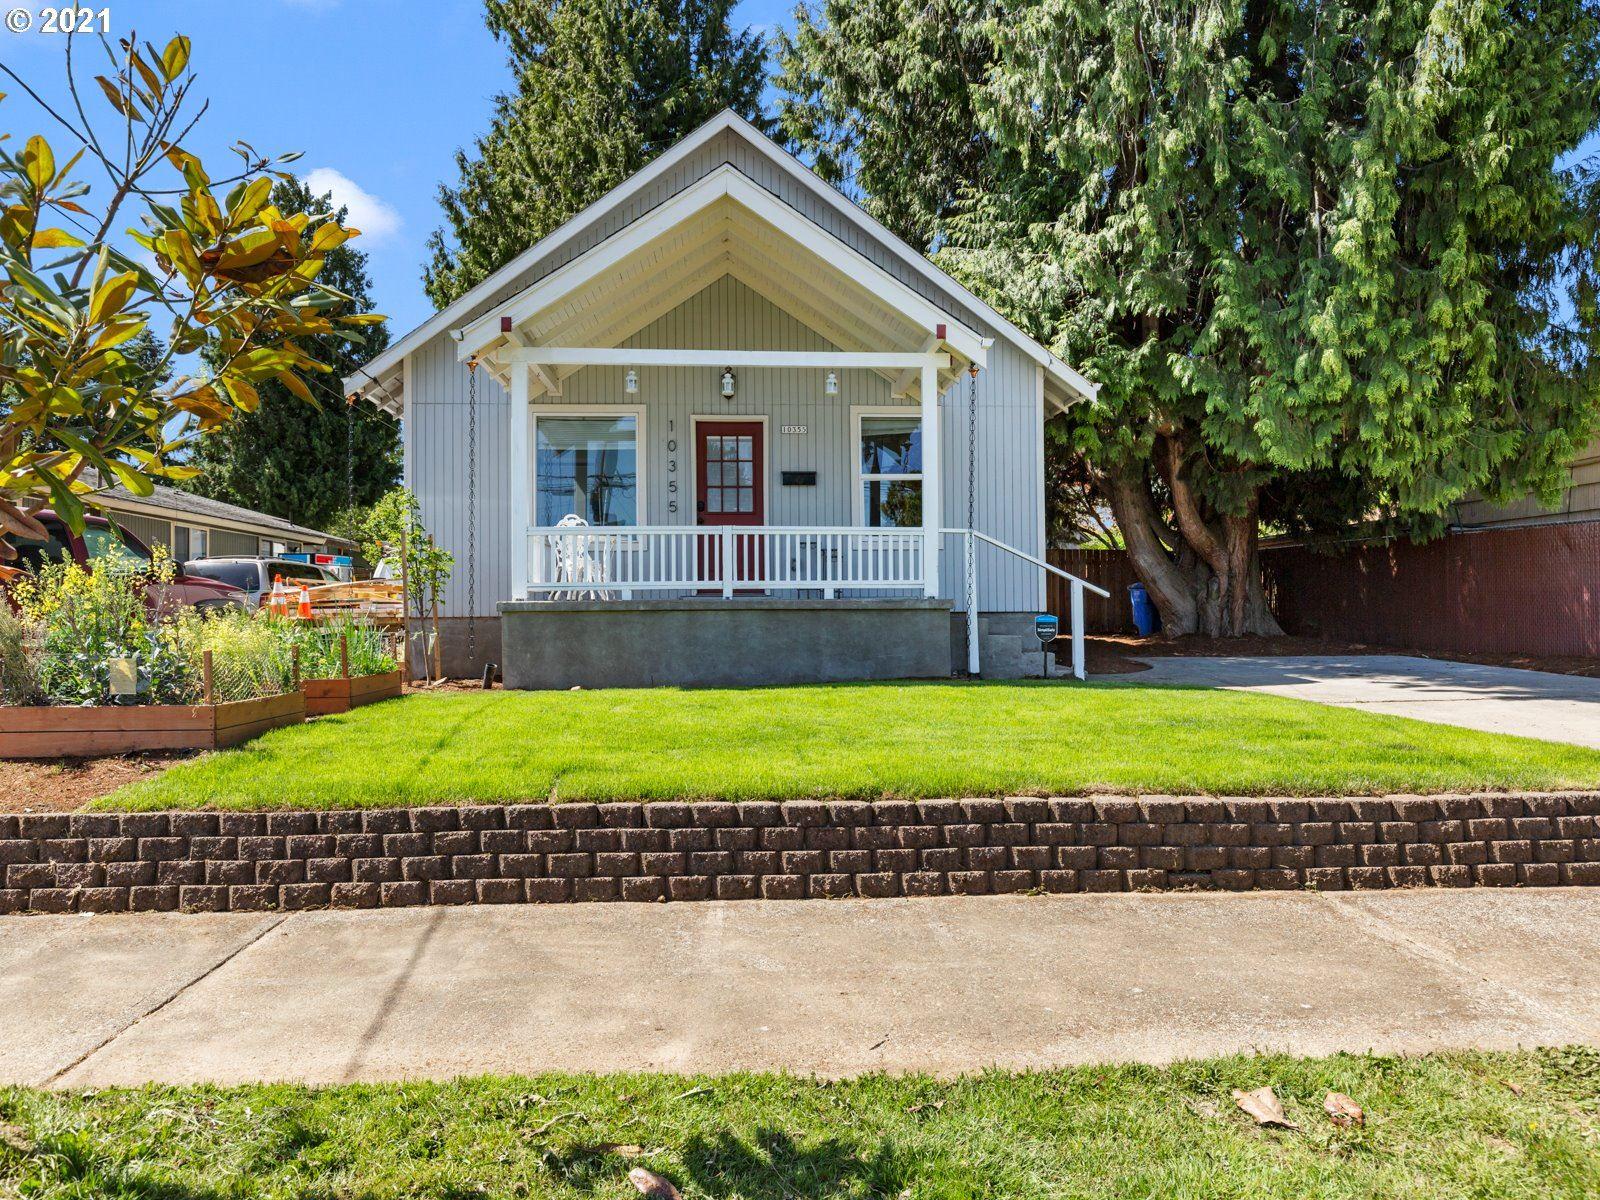 10355 N MOHAWK AVE, Portland, OR 97203 - MLS#: 21197941